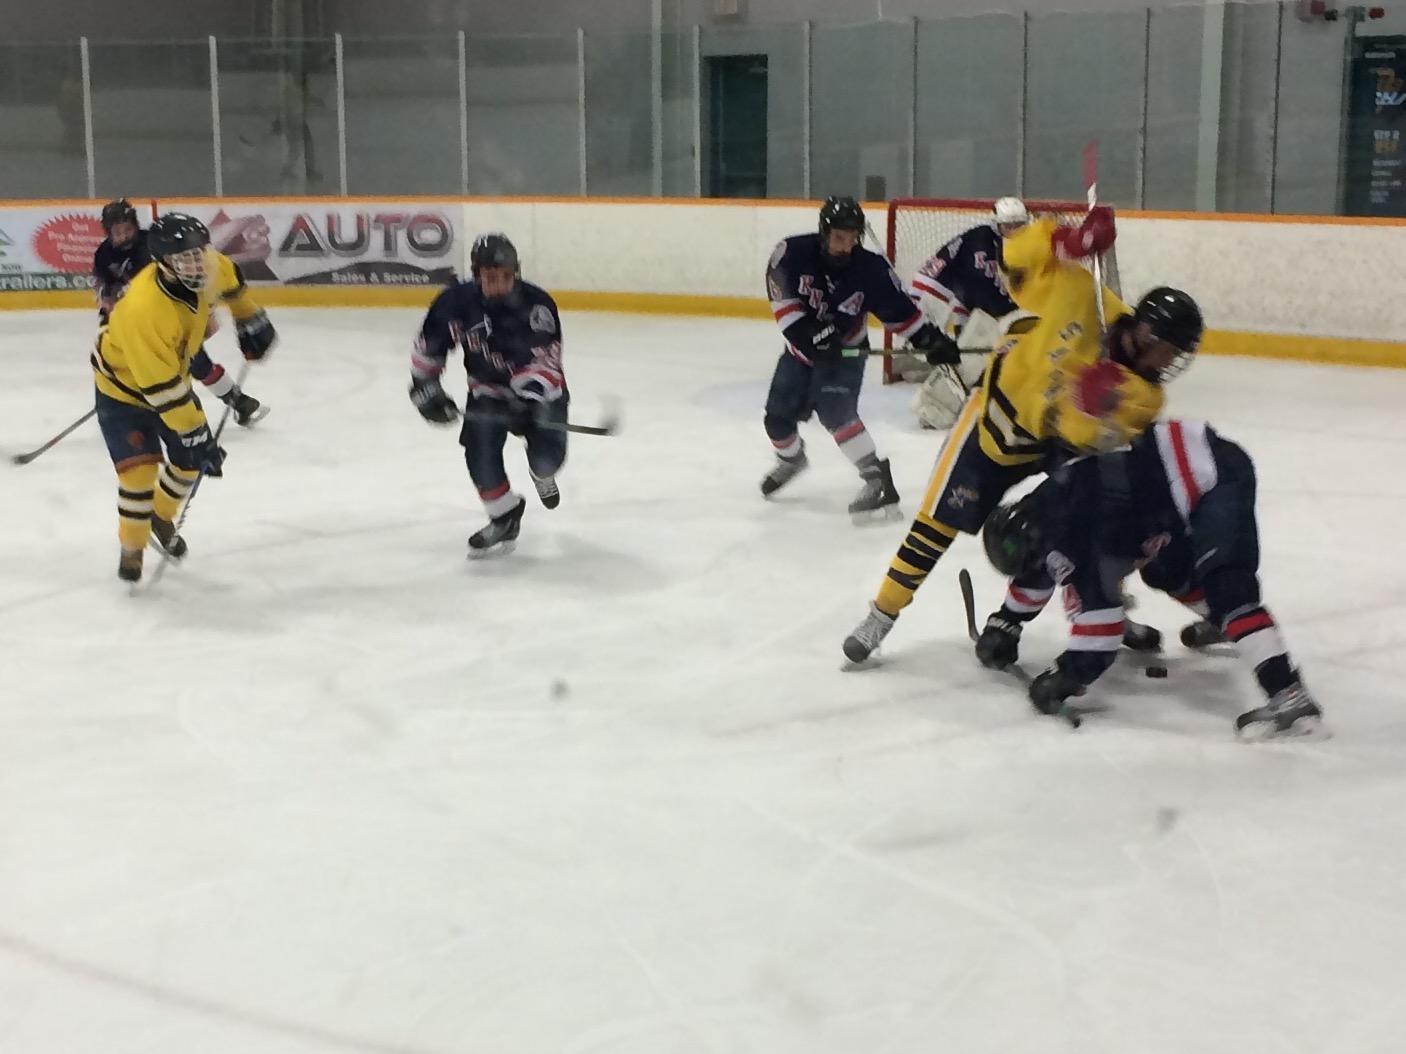 ofsaa hockey 2019